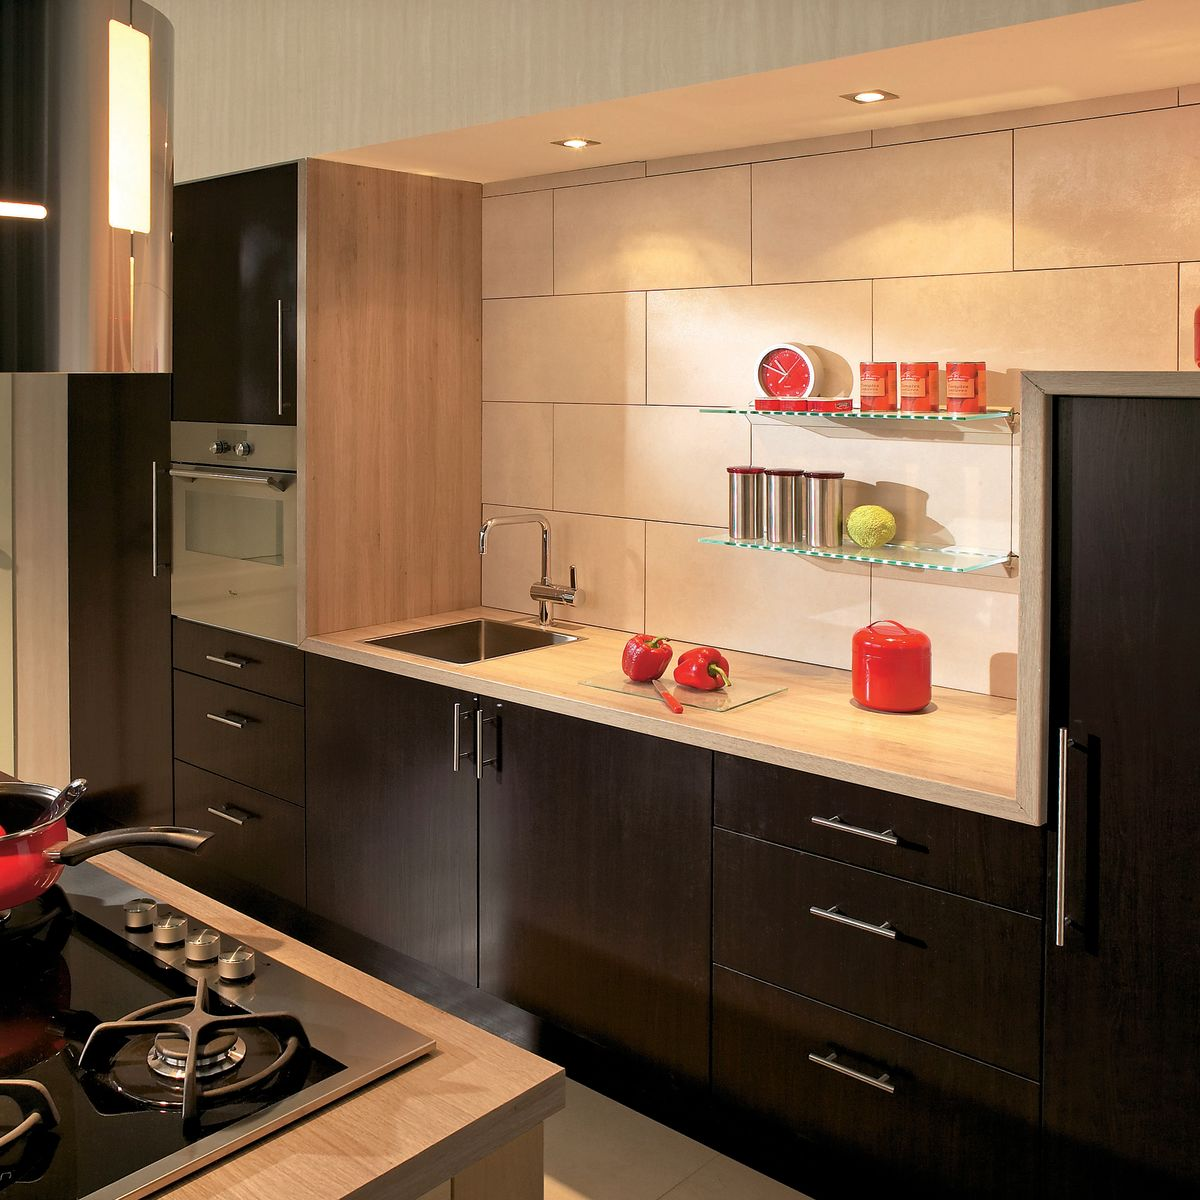 Favoloso Cucina Wenge Delinia: prezzi e offerte online | Leroy Merlin RQ67